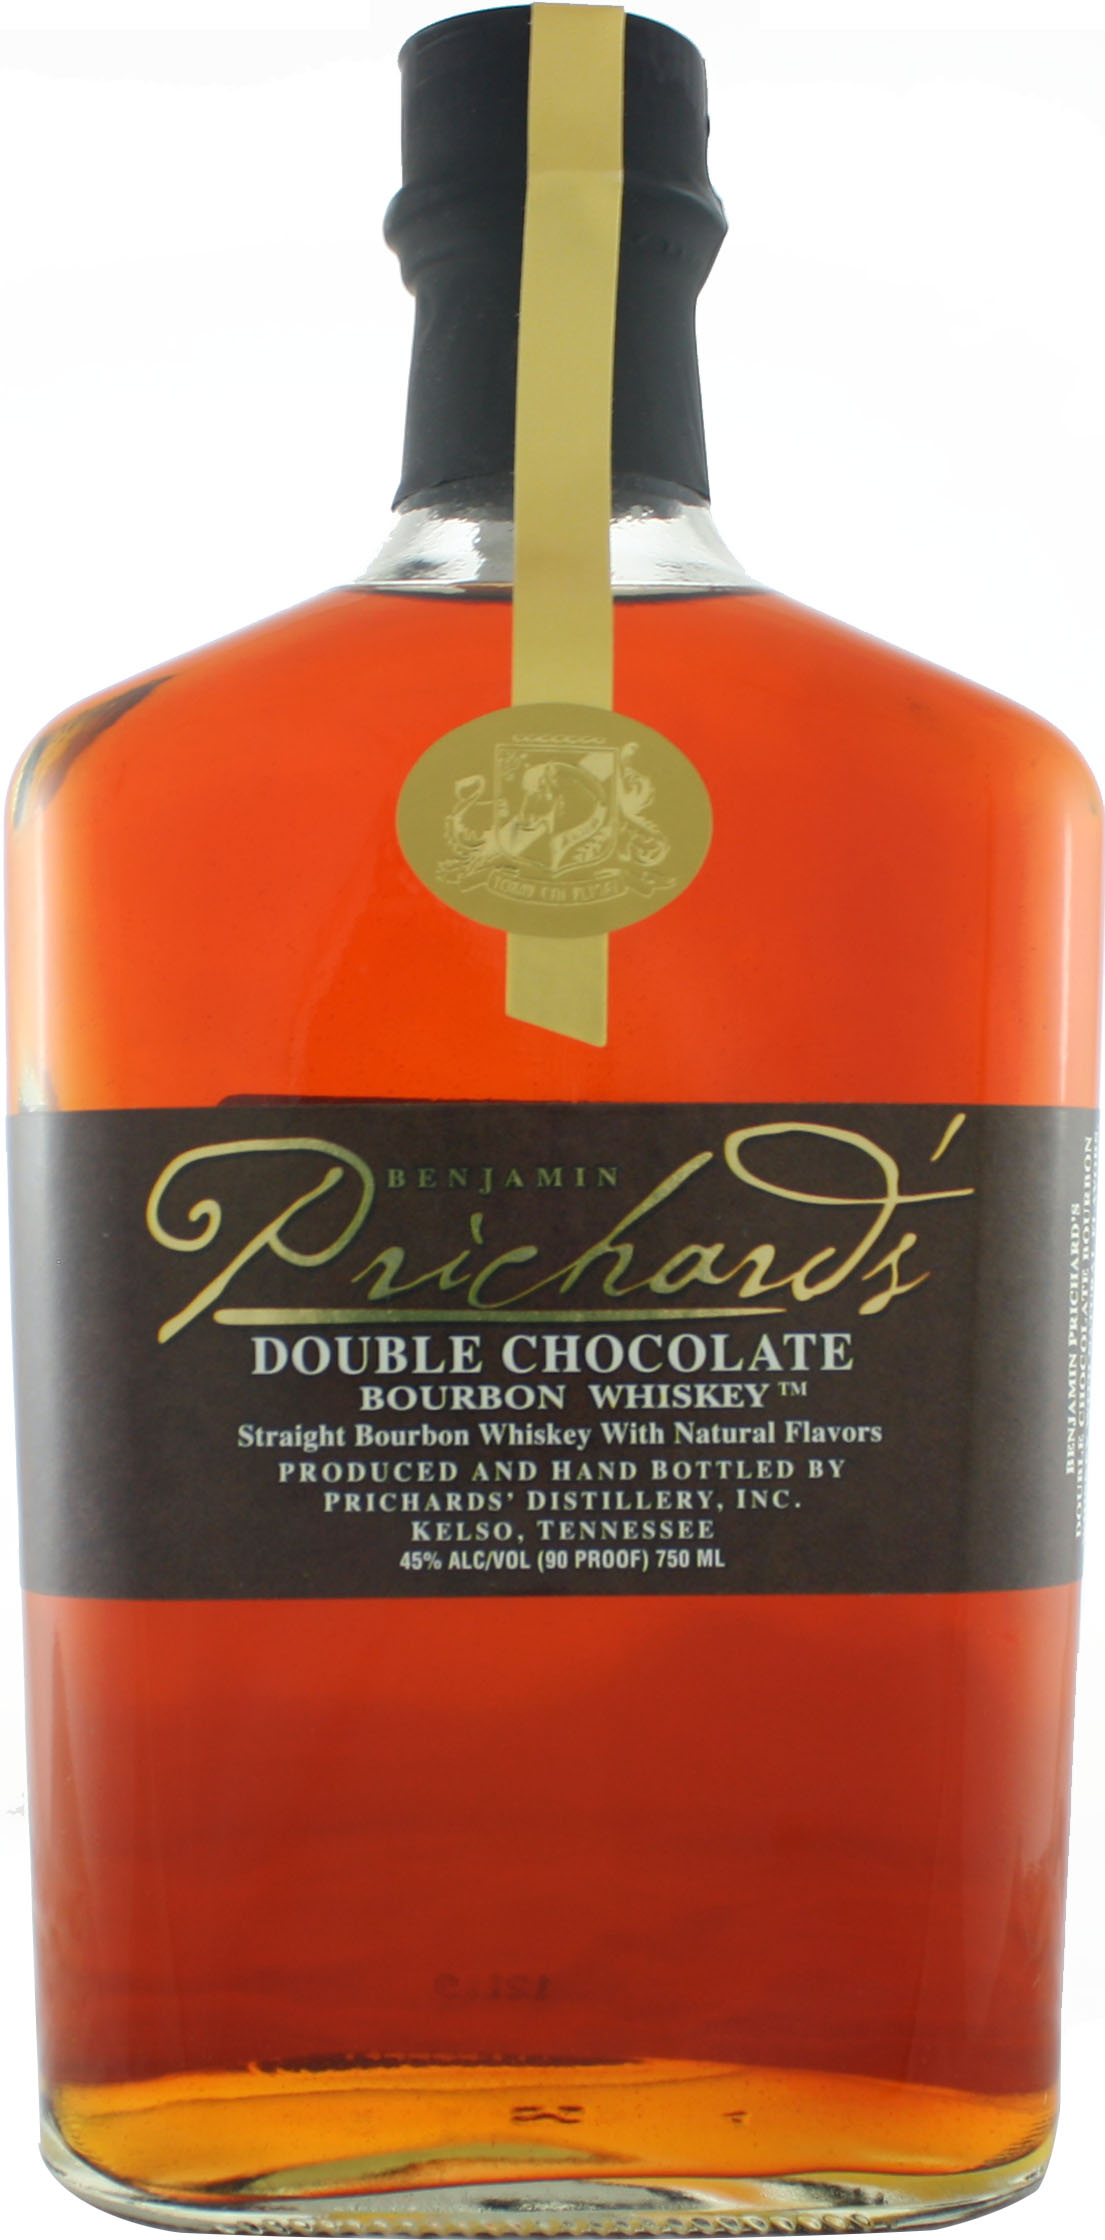 Prichards Double Chocolate Bourbon